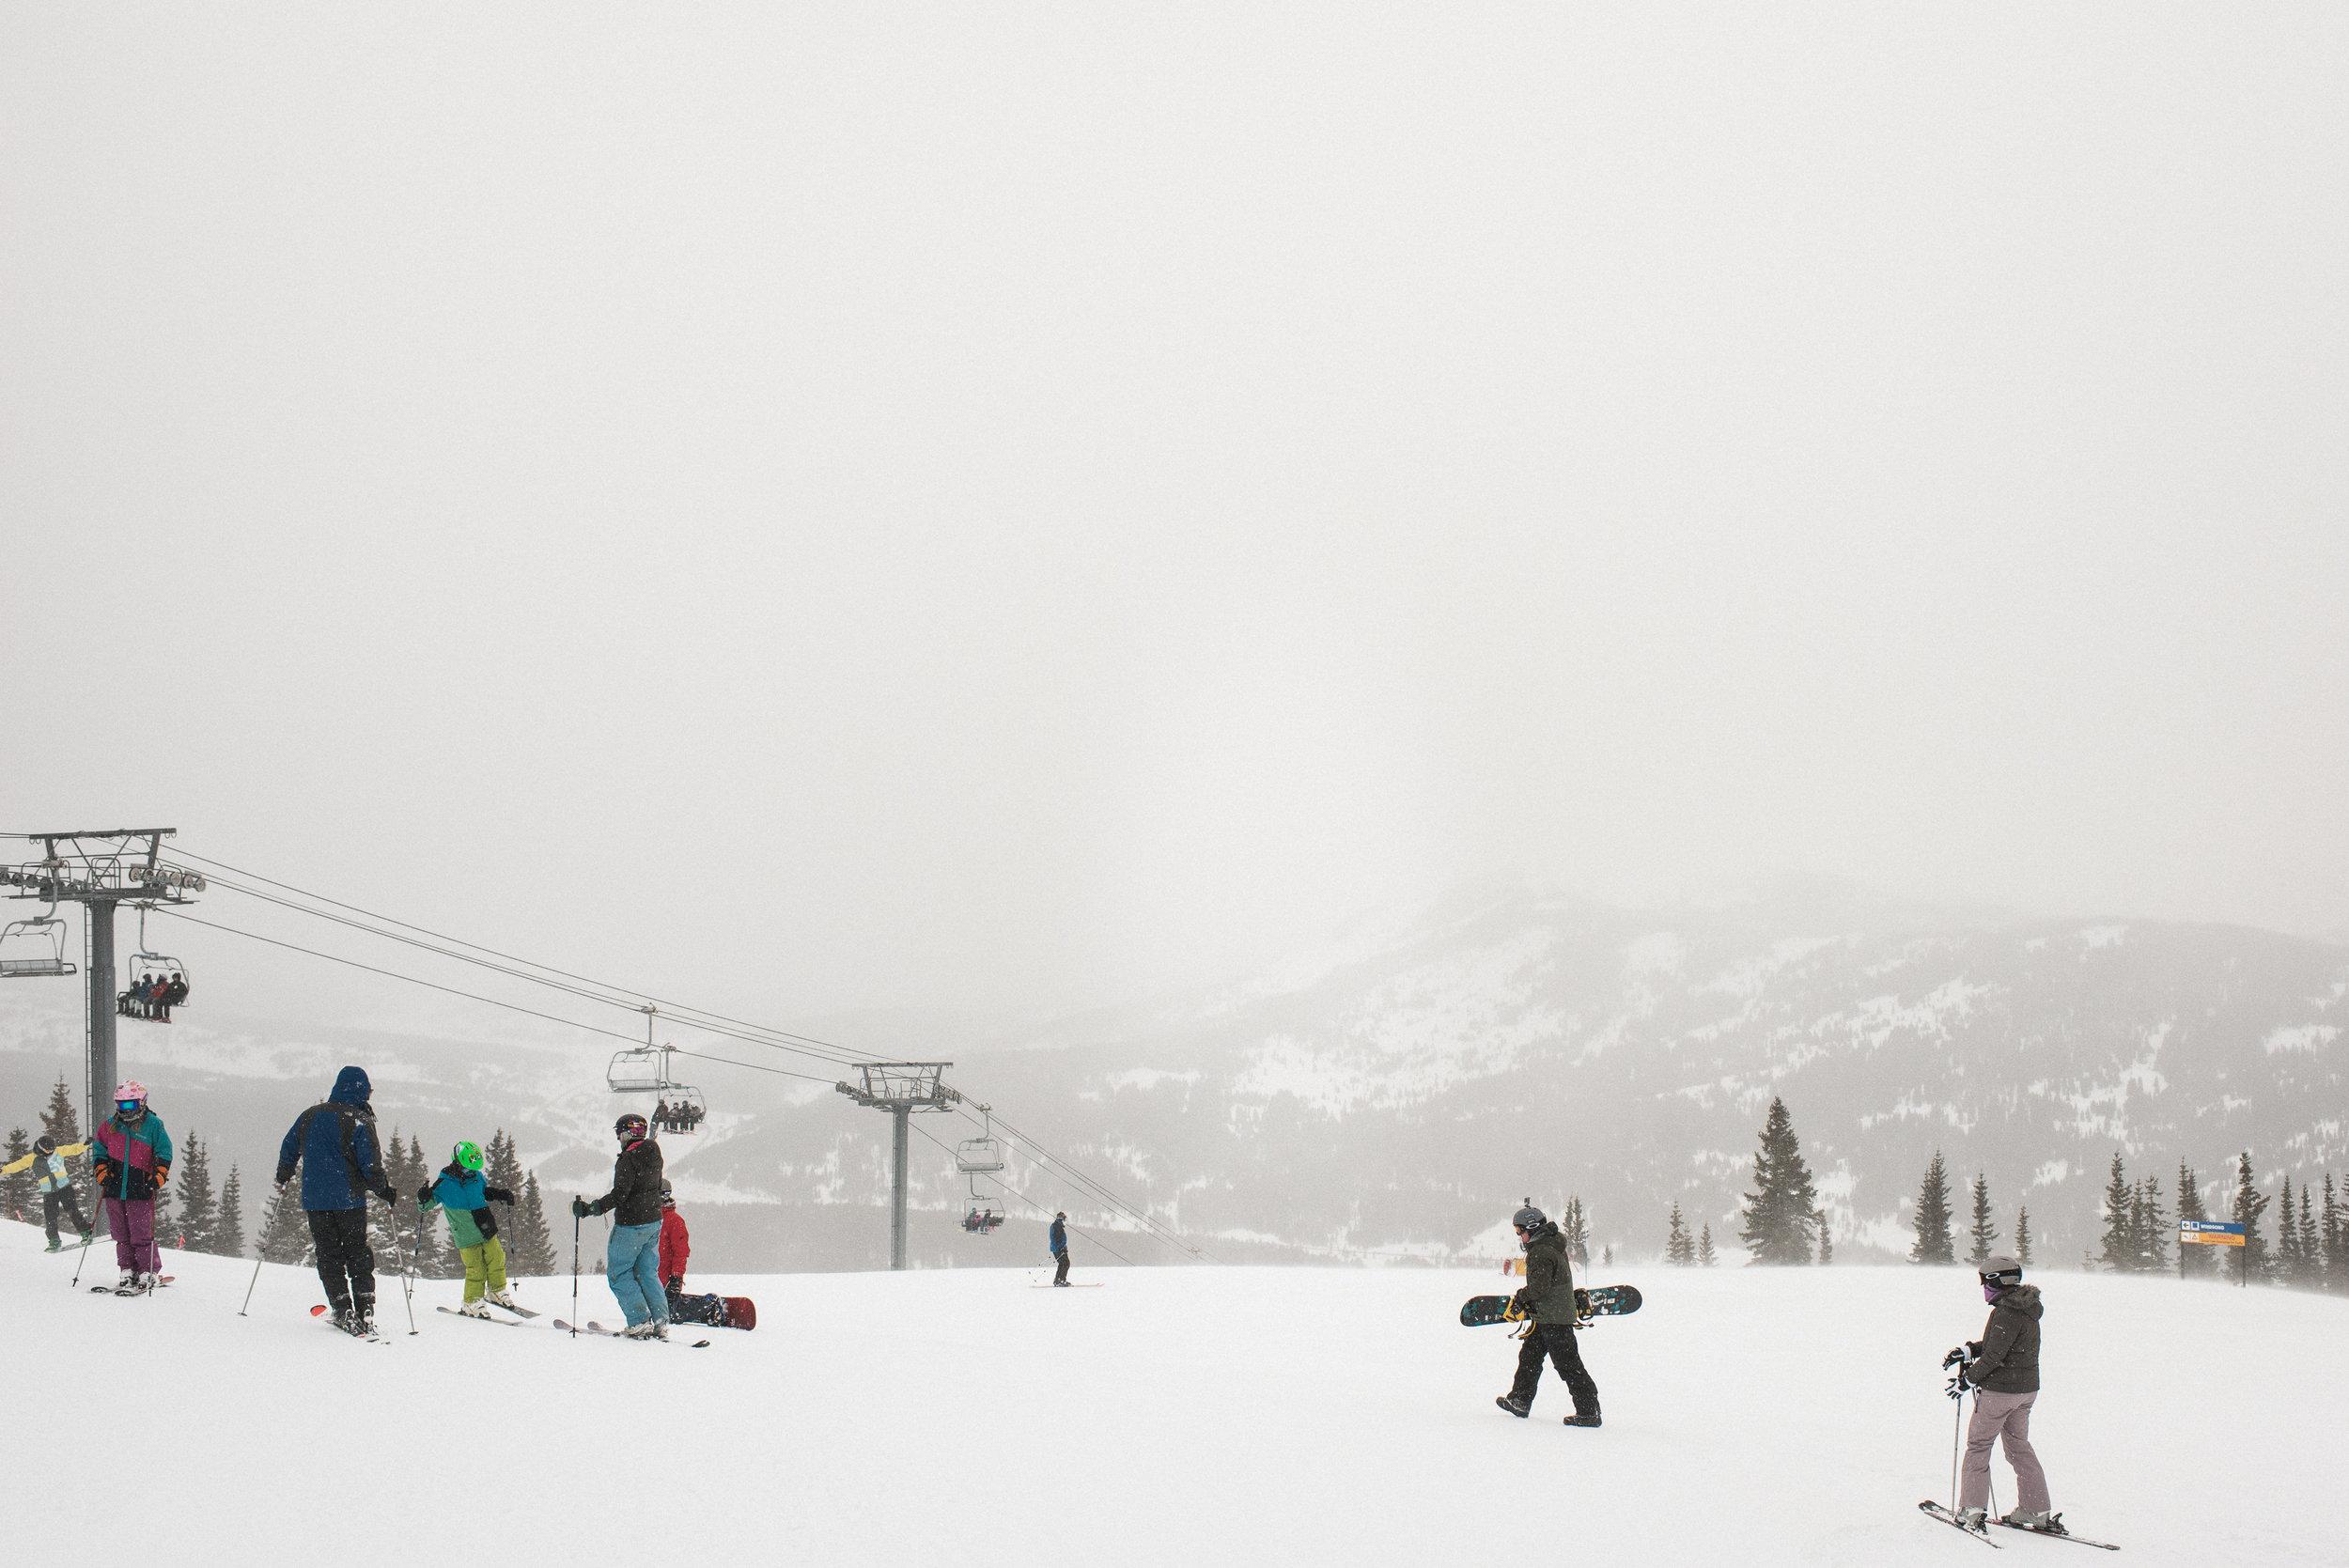 TaraShupe_Outdoor_Photographer_Loweprobags_Colorado_Copper_Mountains_Ski_20.jpg